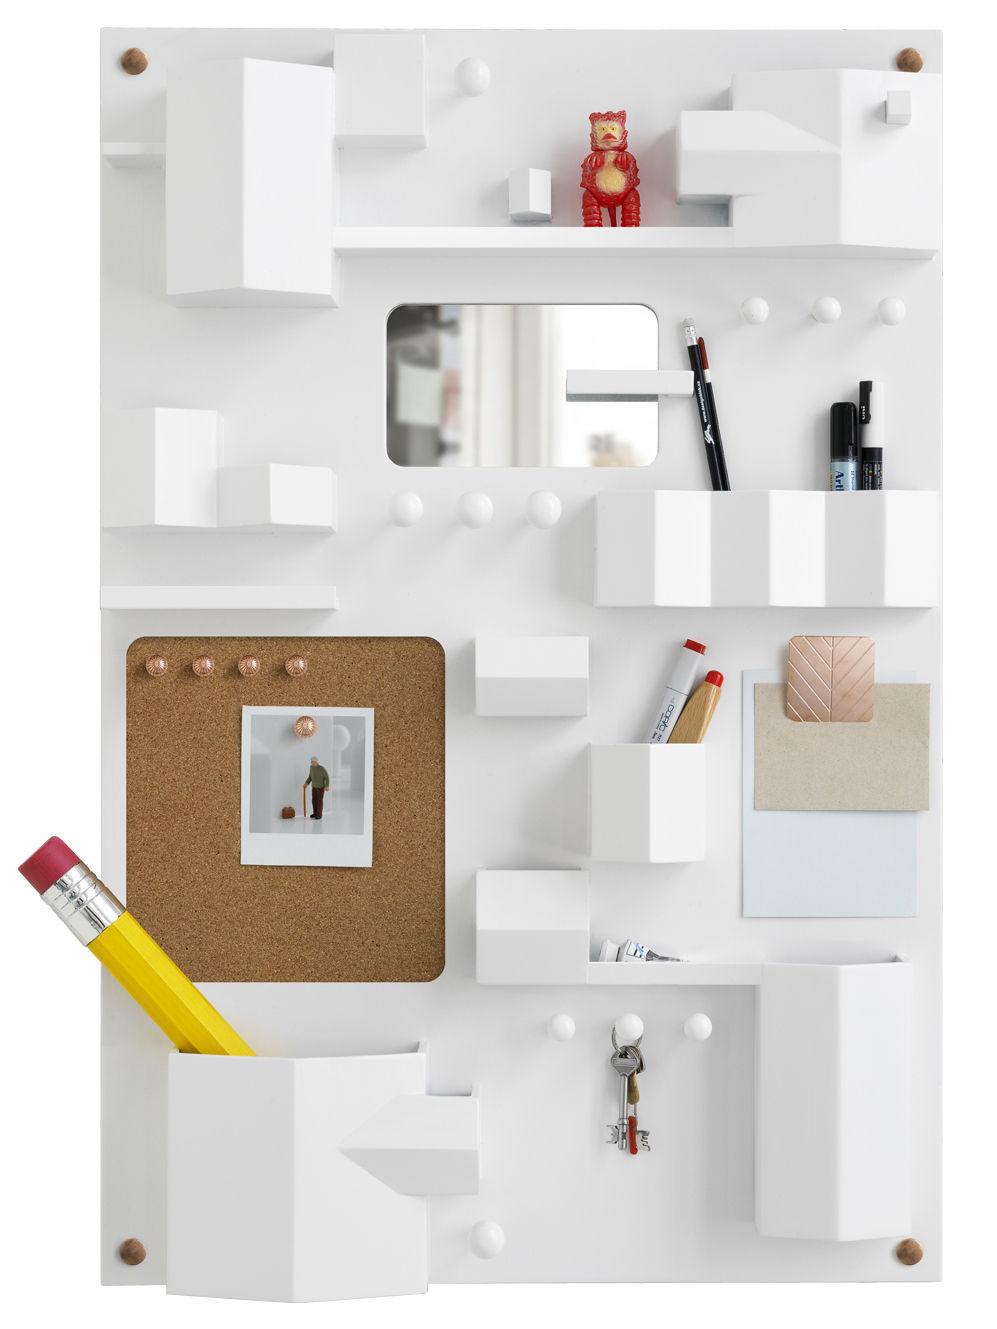 rangement mural suburbia seletti blanc l 55 x h 82 made in design. Black Bedroom Furniture Sets. Home Design Ideas